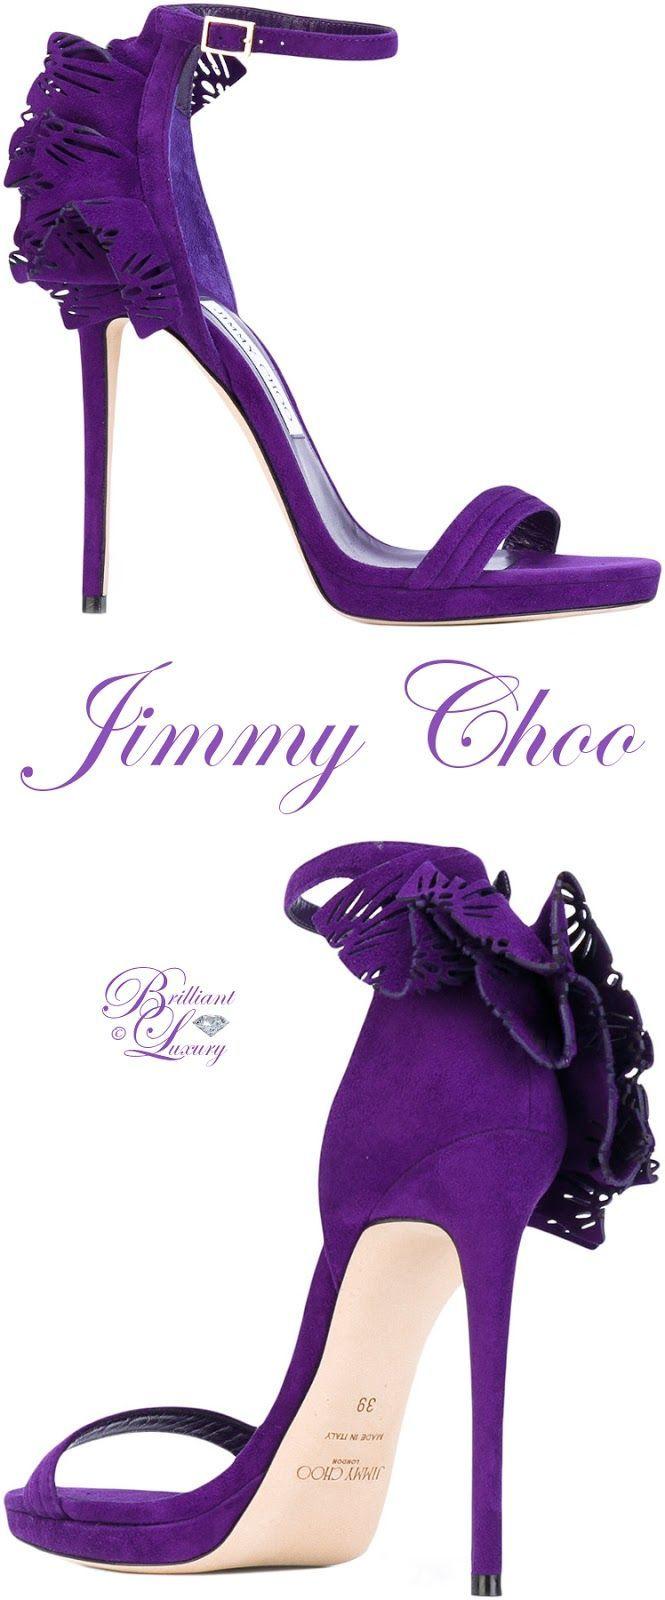 Brilliant Luxury by Emmy DE ♦ Jimmy Choo Kelly Sandals. Not really a fan of purple, but the style ❣️